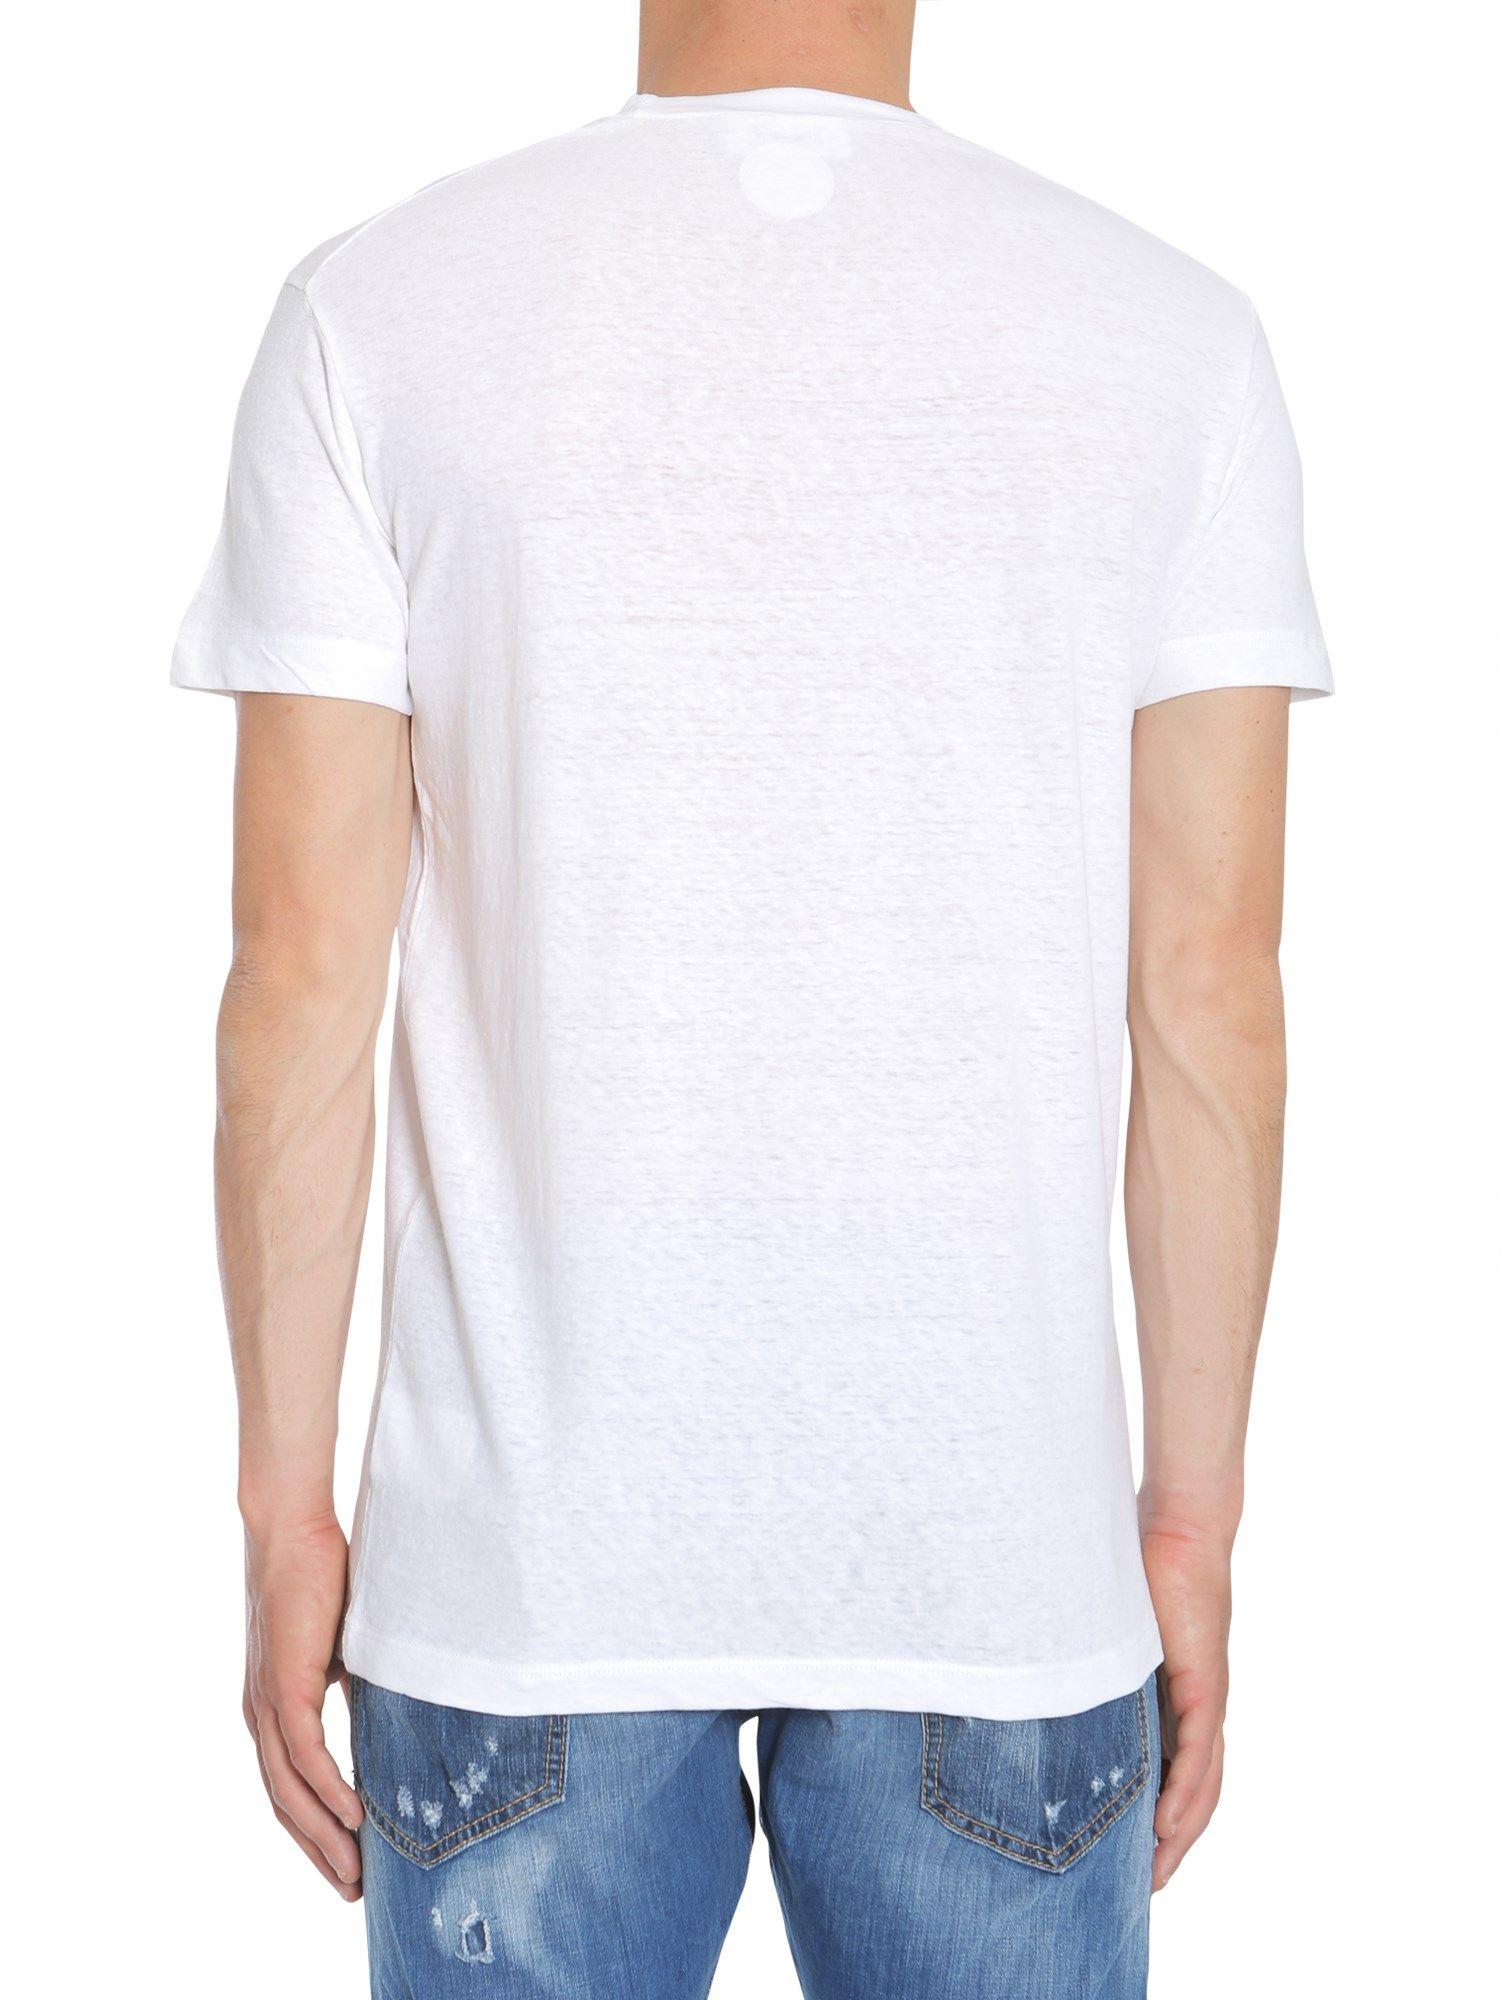 Dsquared2 round collar t shirt bianco men 39 s short for Round collar shirt men